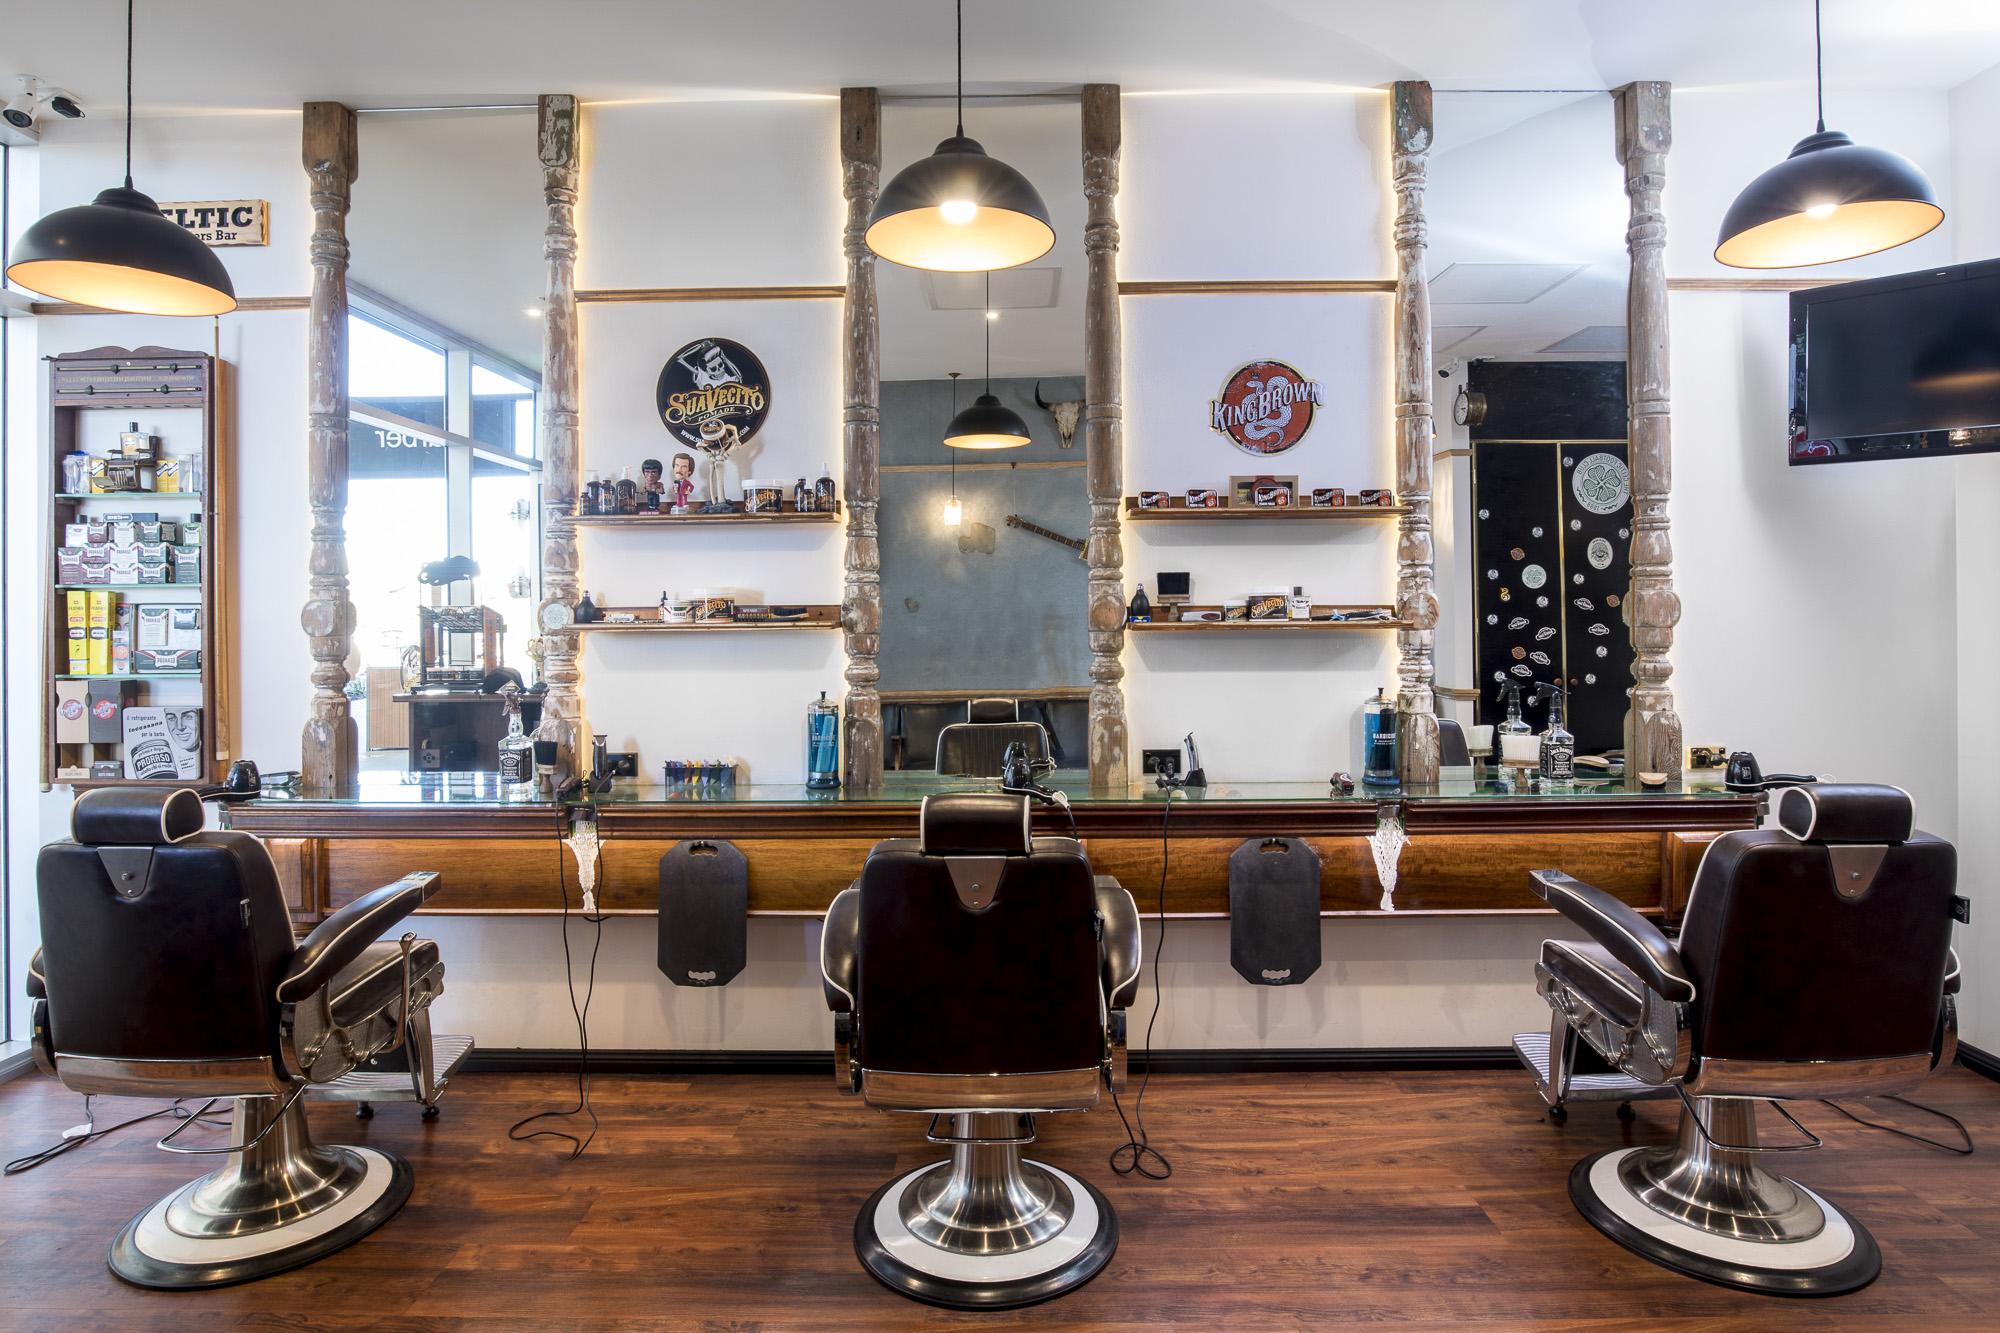 brasco's barbershop - Casuarina